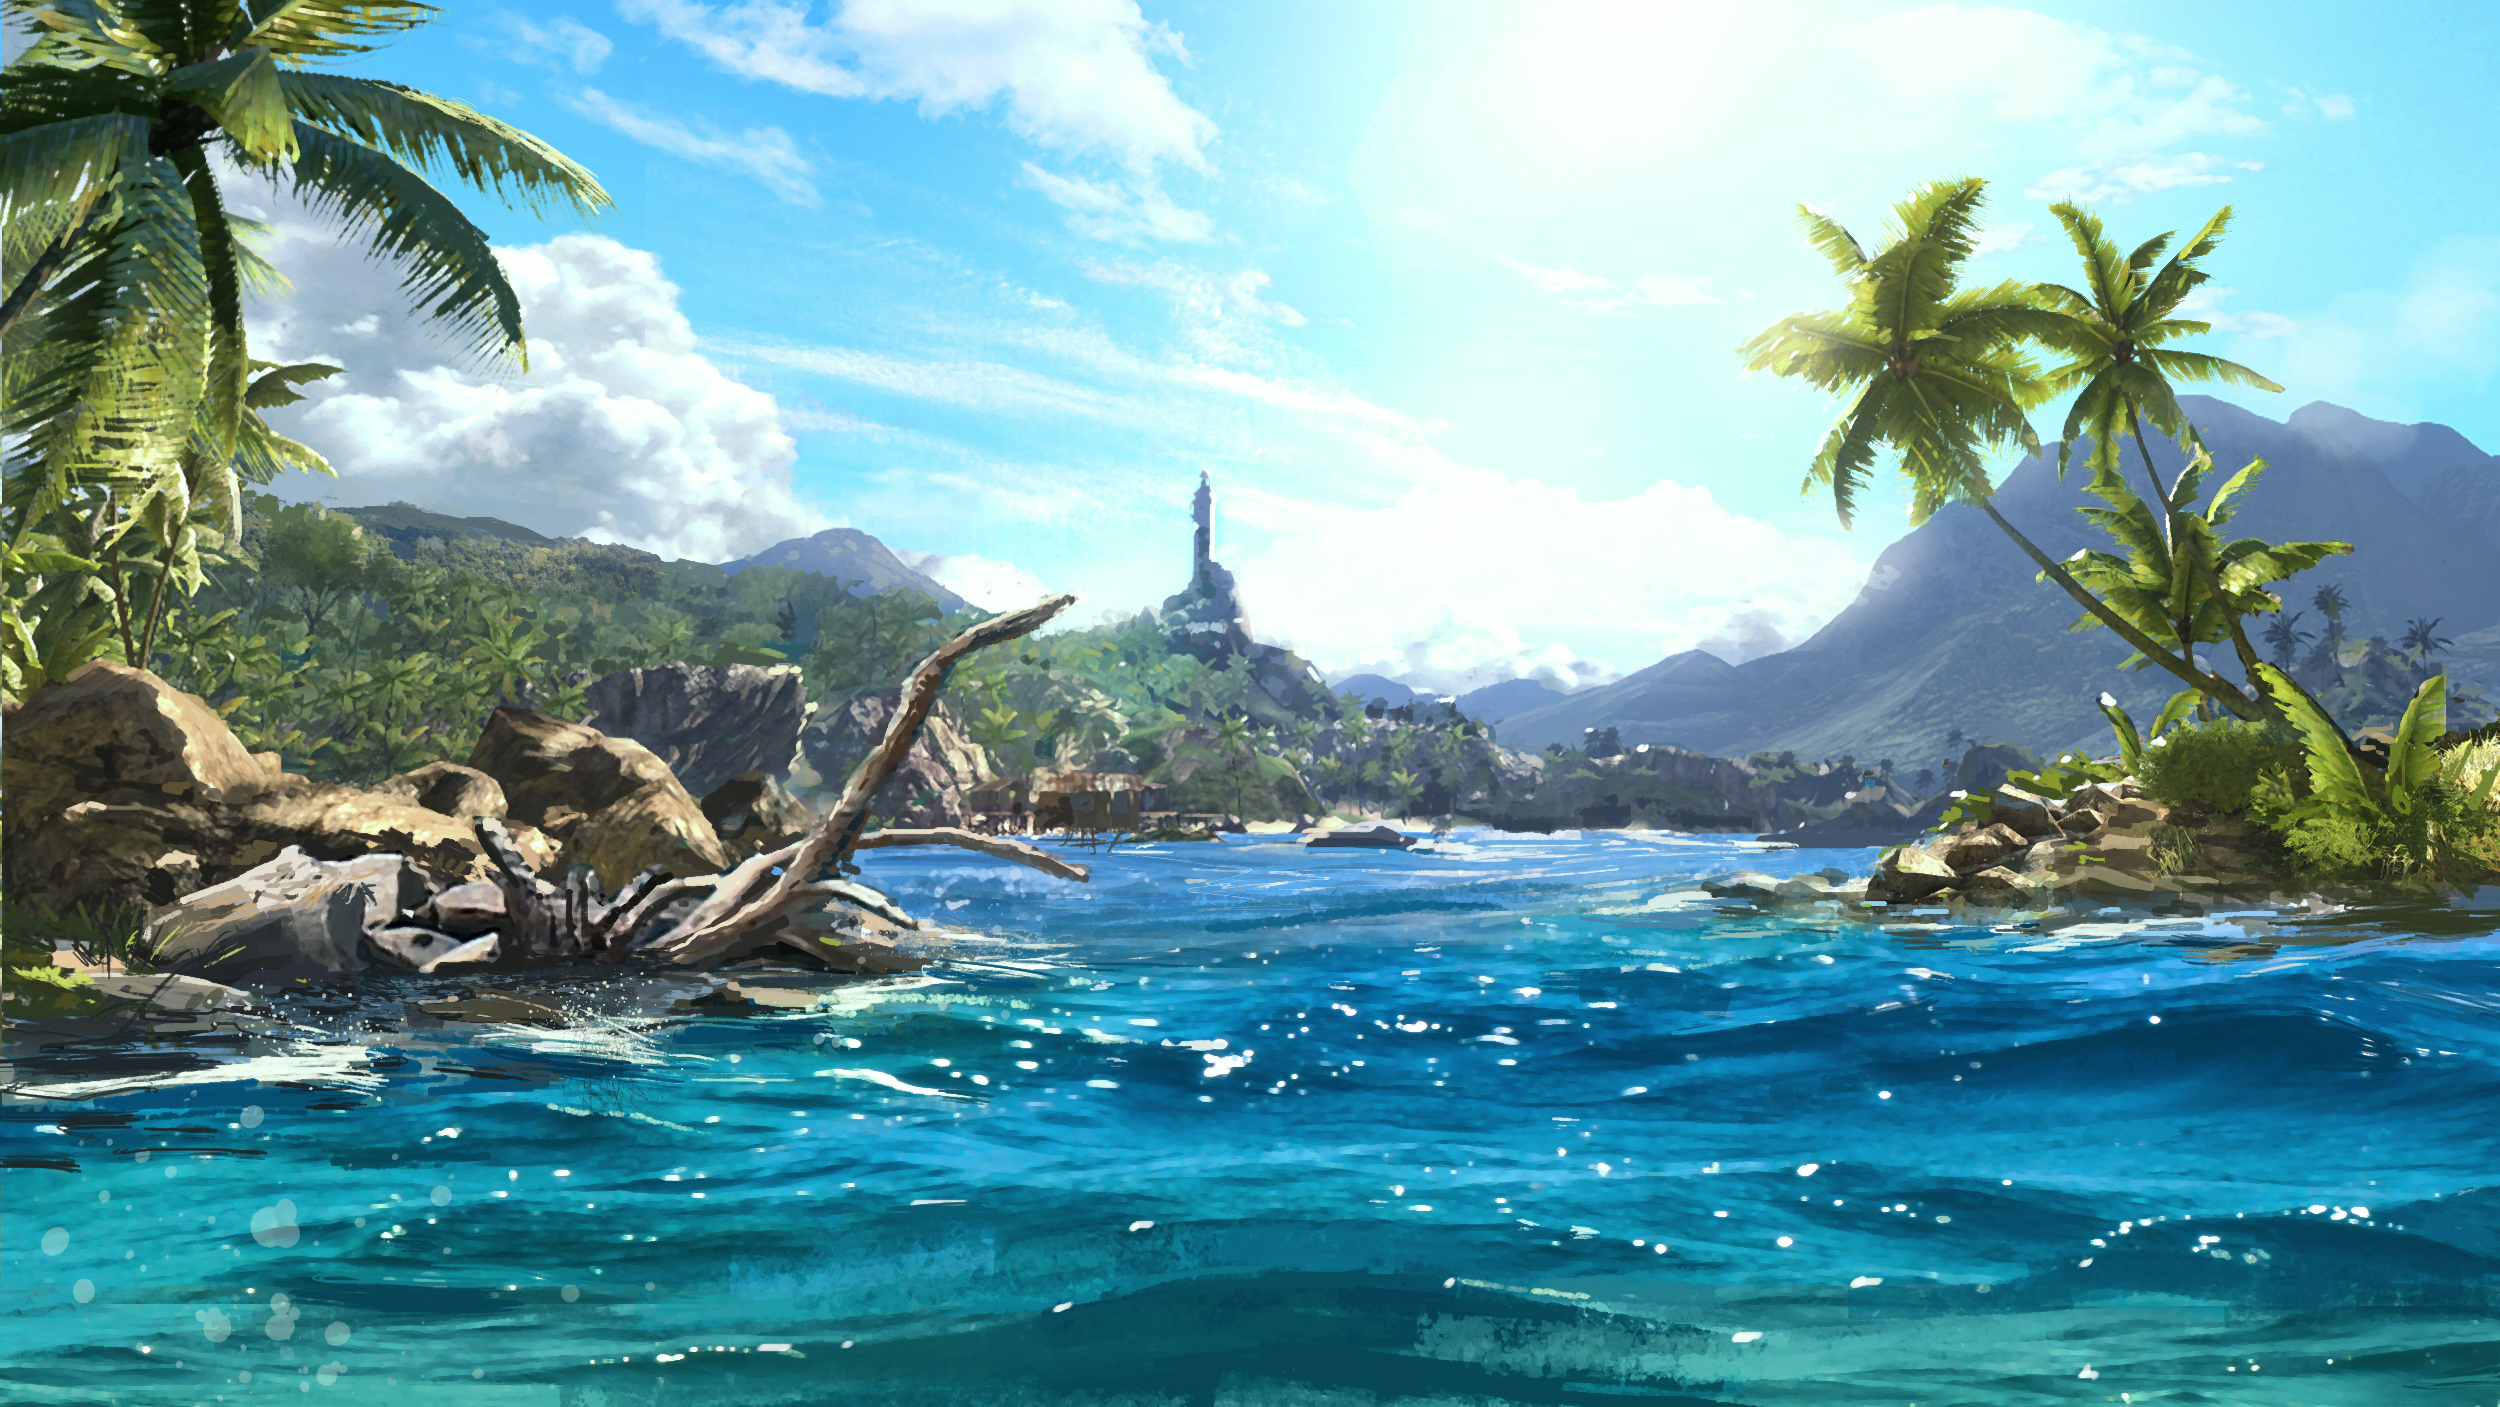 Far Cry 3 Sea Water Tropics Palma Games Fantasy Landscape F Wallpaper